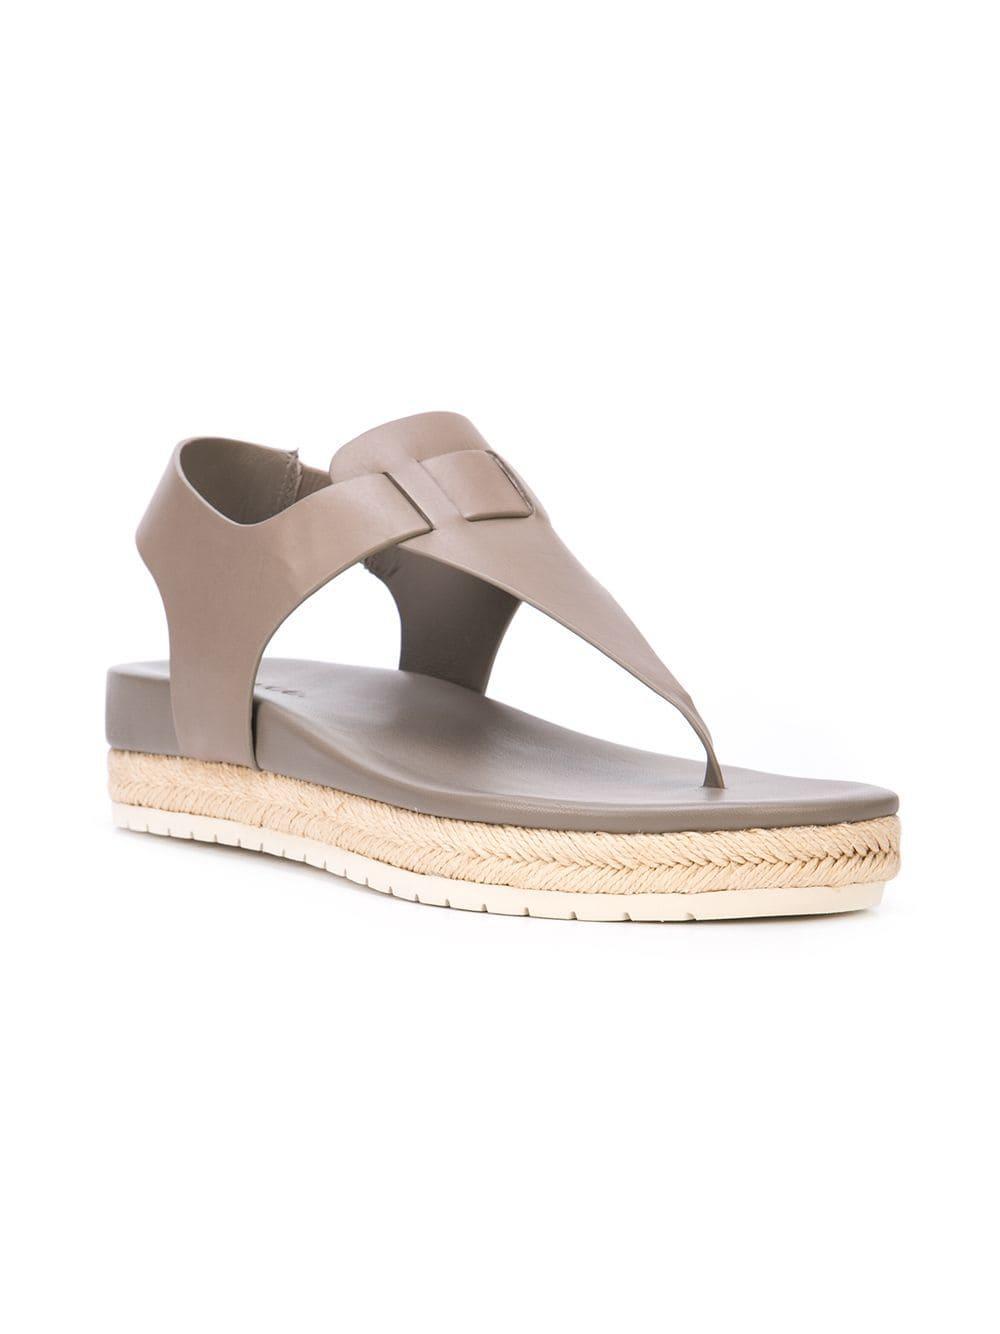 Flint Gray Sandals In Lyst Vince Tga8A